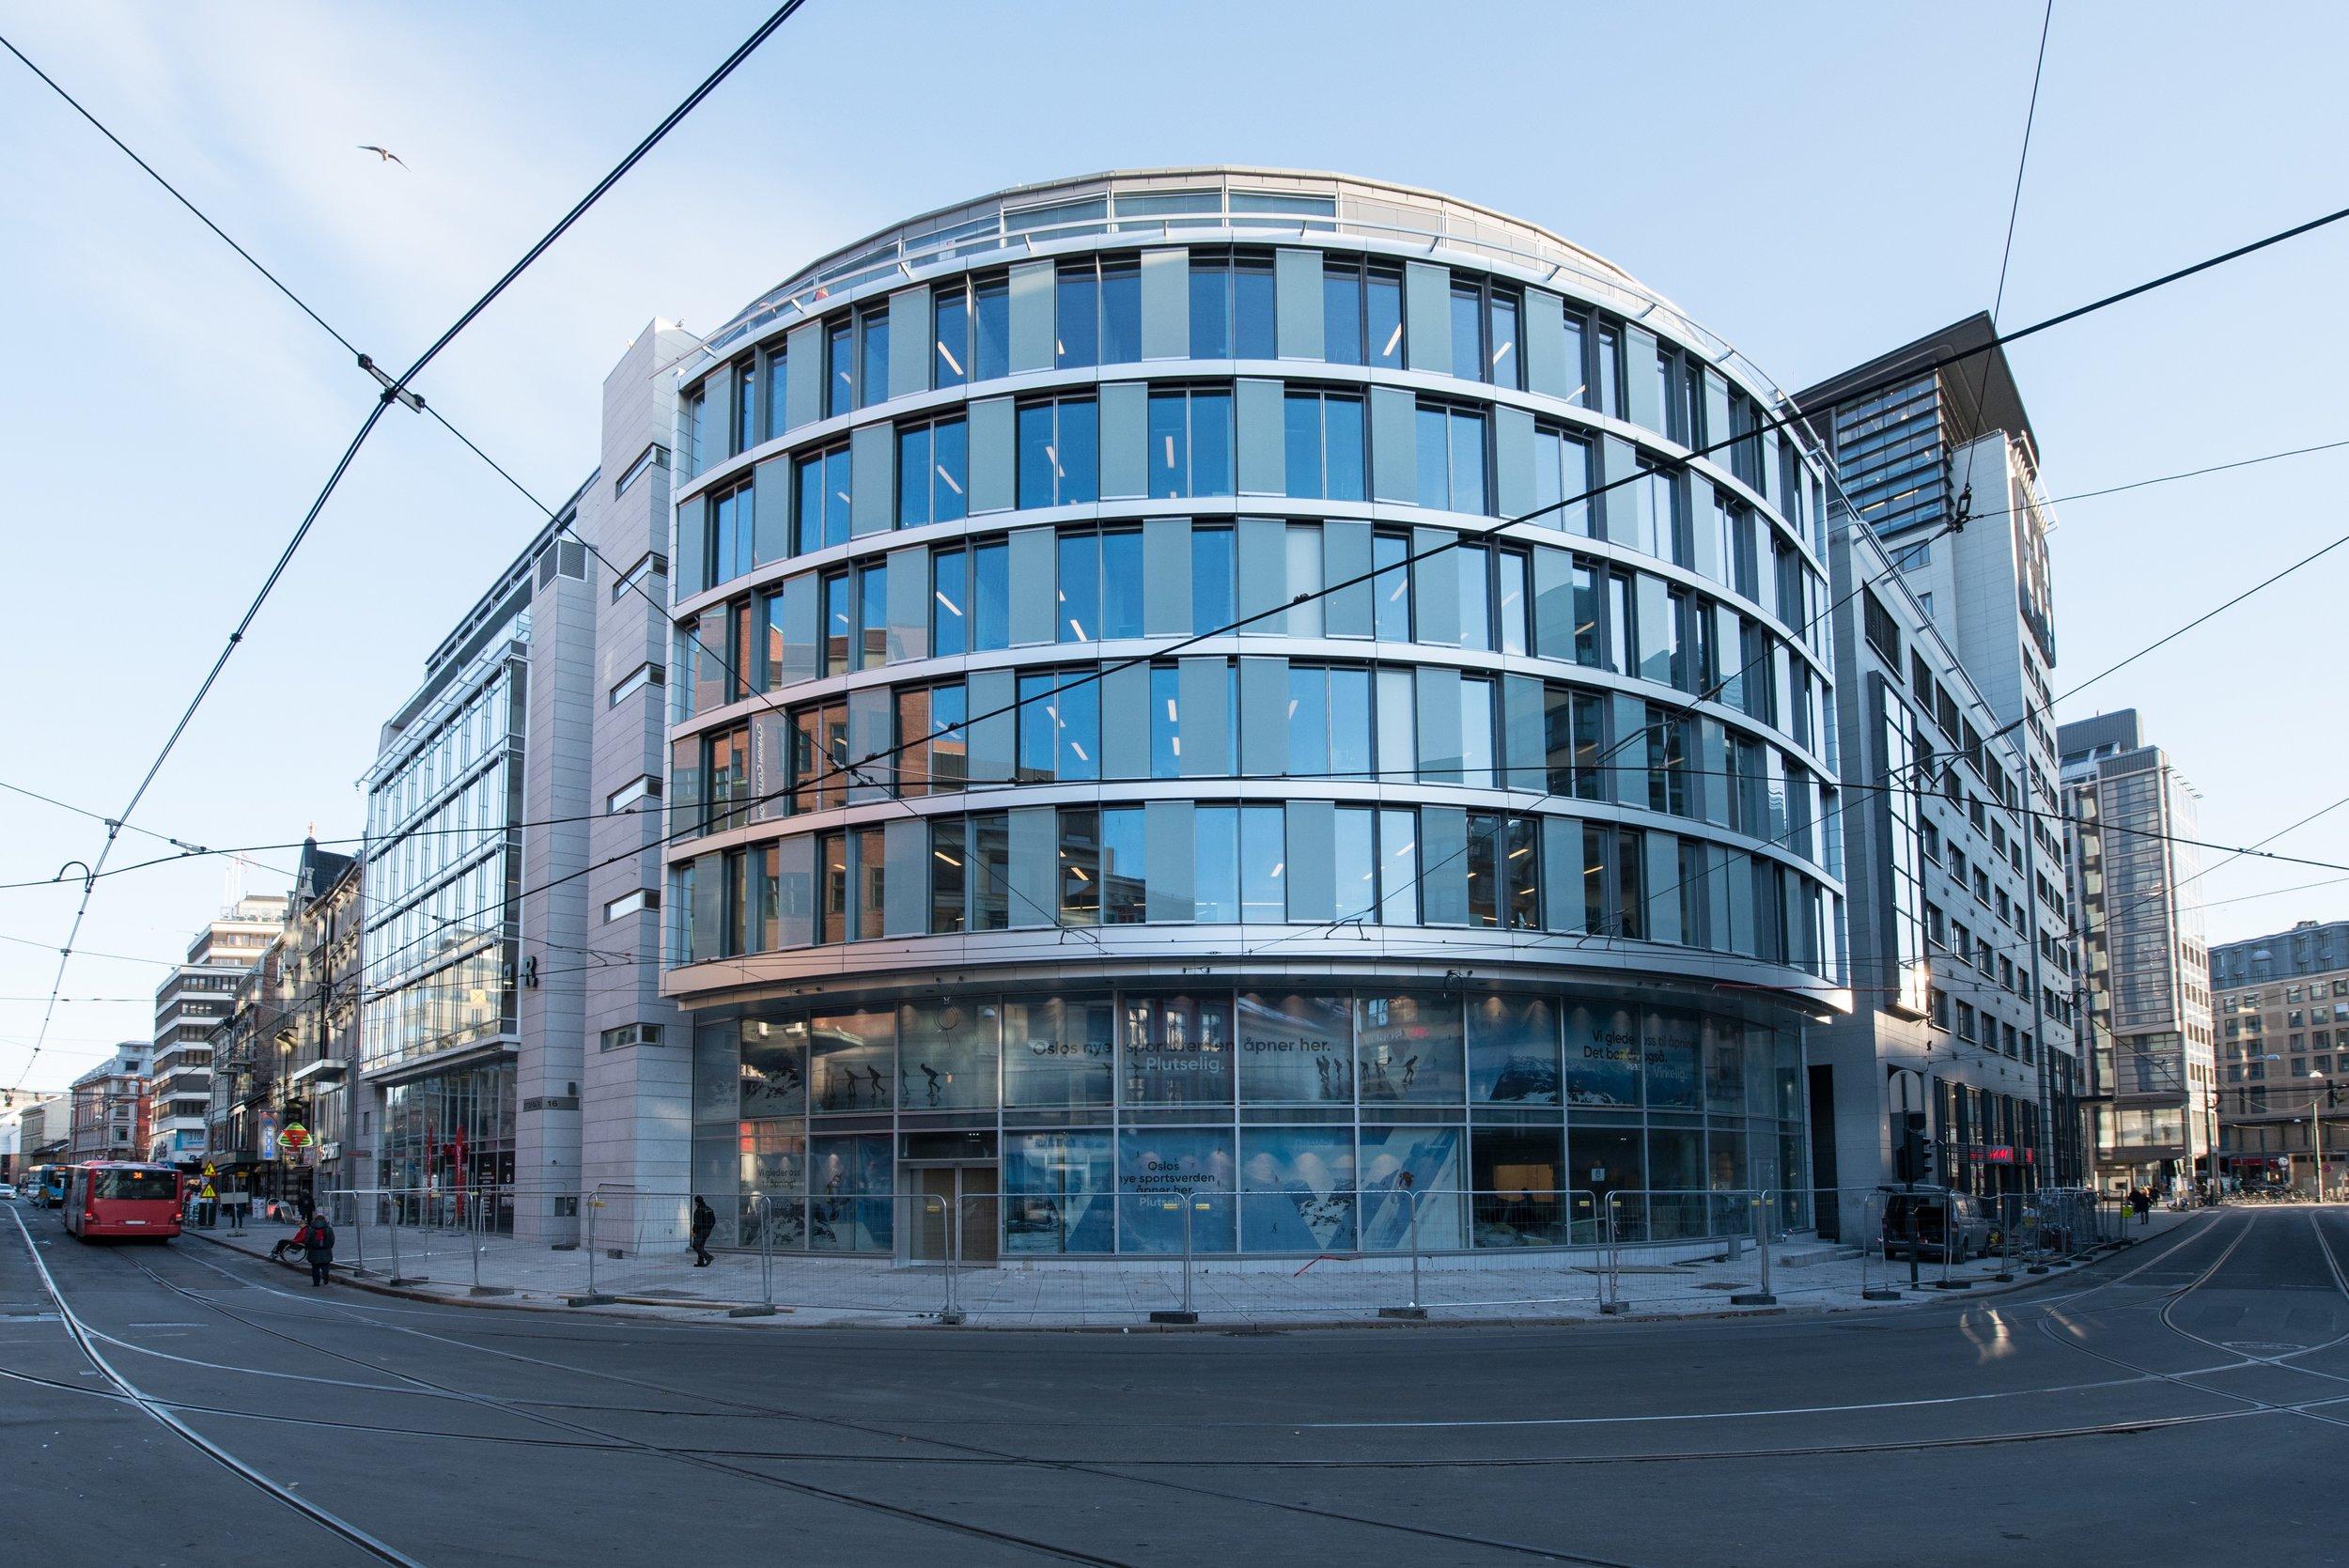 Foto:Byggeindustrien/bygg.no